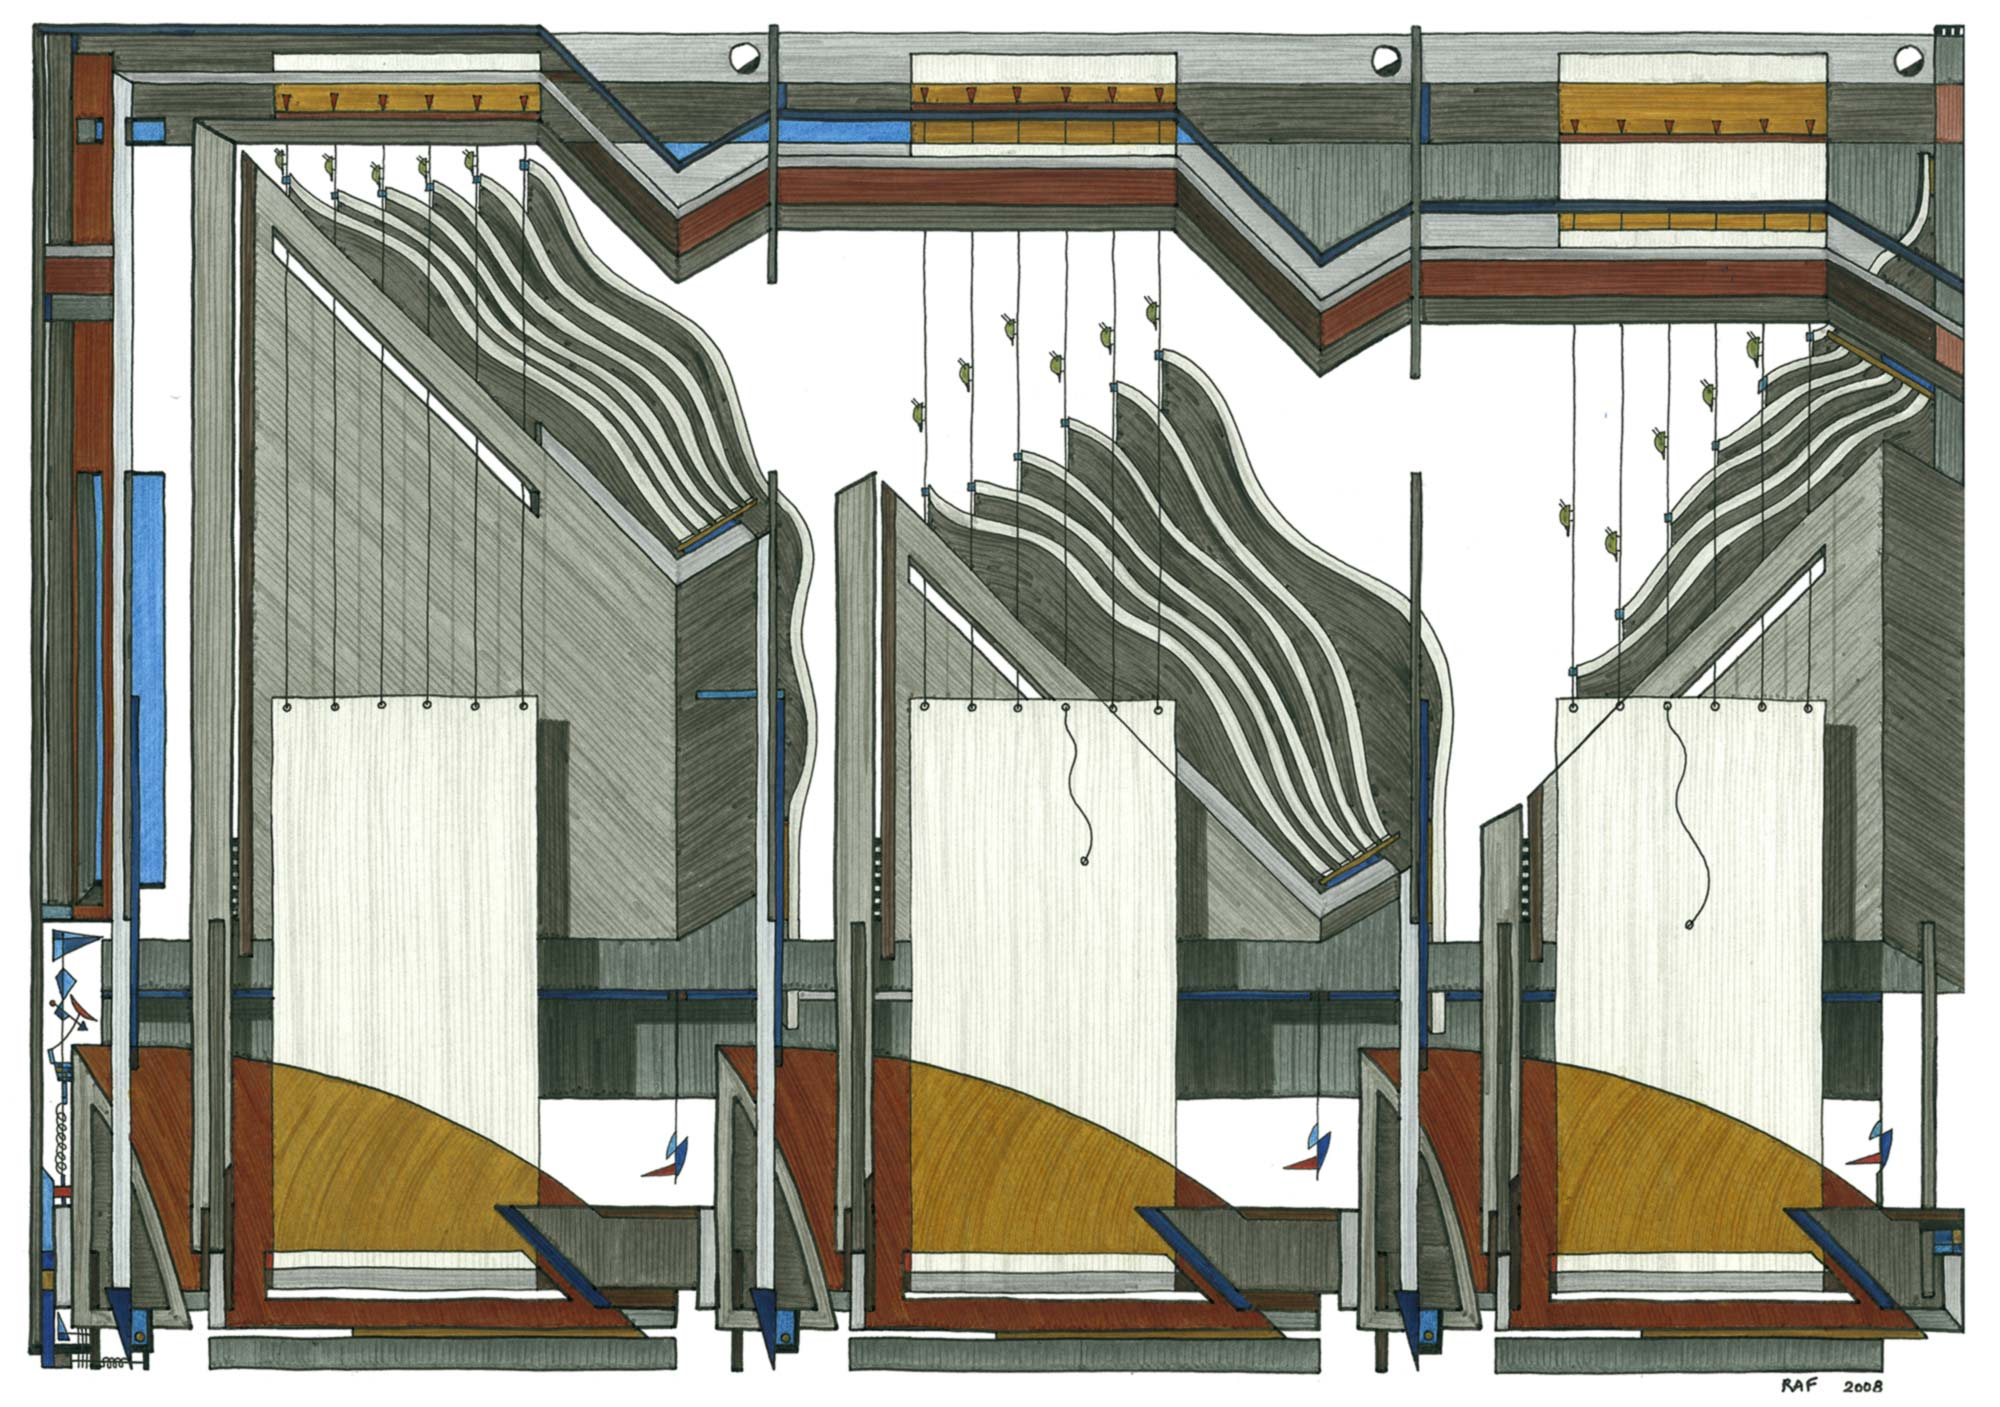 Lectures d'insectes, dessin, Raf Listowski, 2008